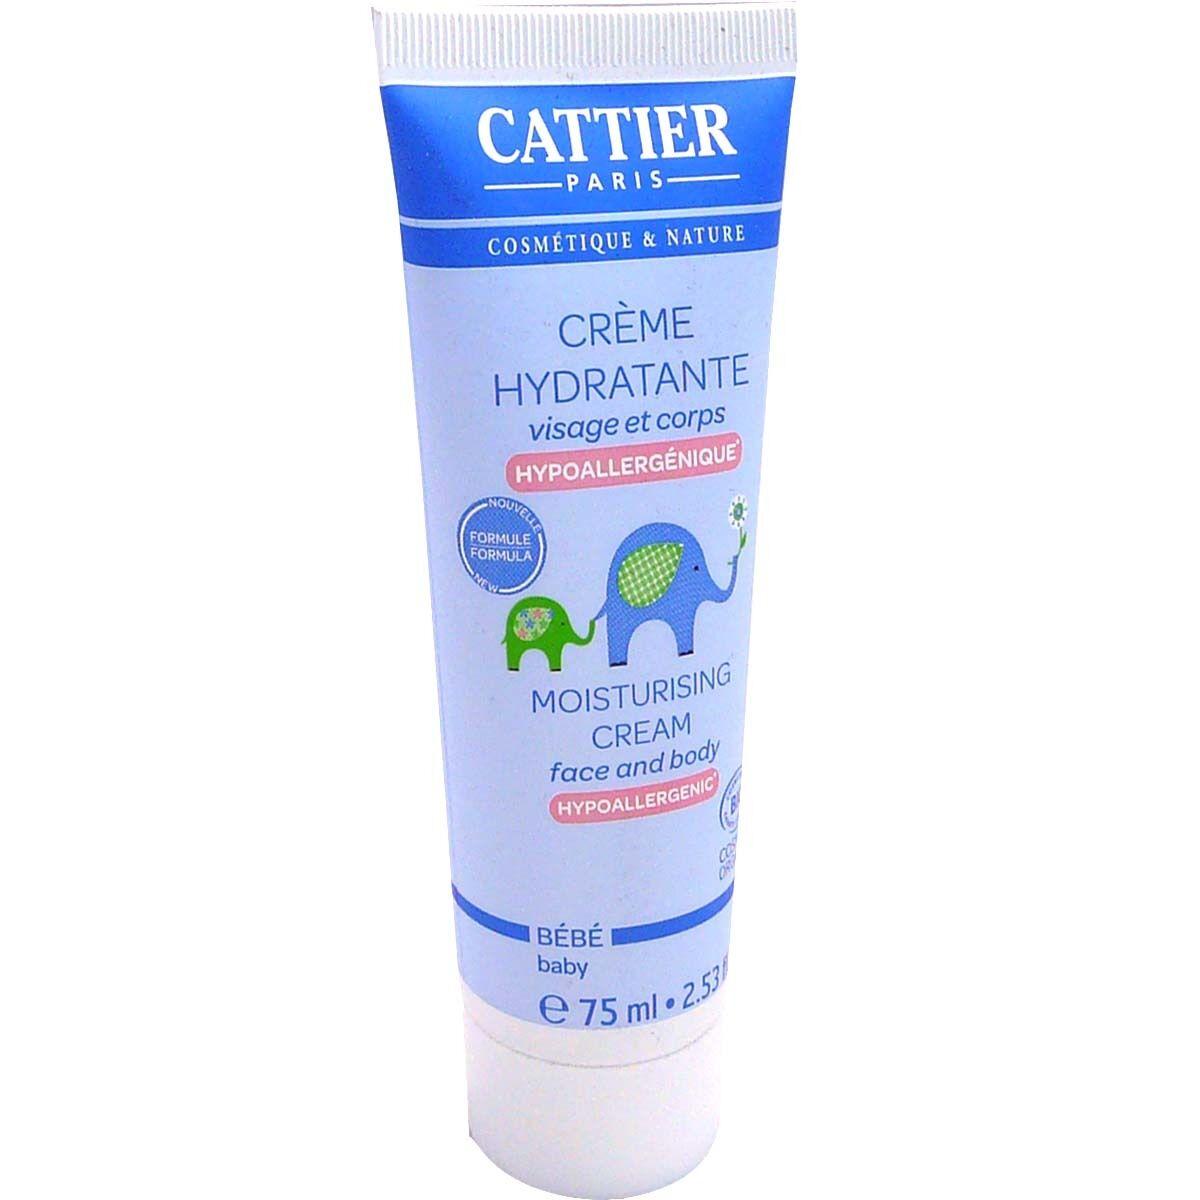 Cattier bebe creme hydratante bio visage et corps 75ml